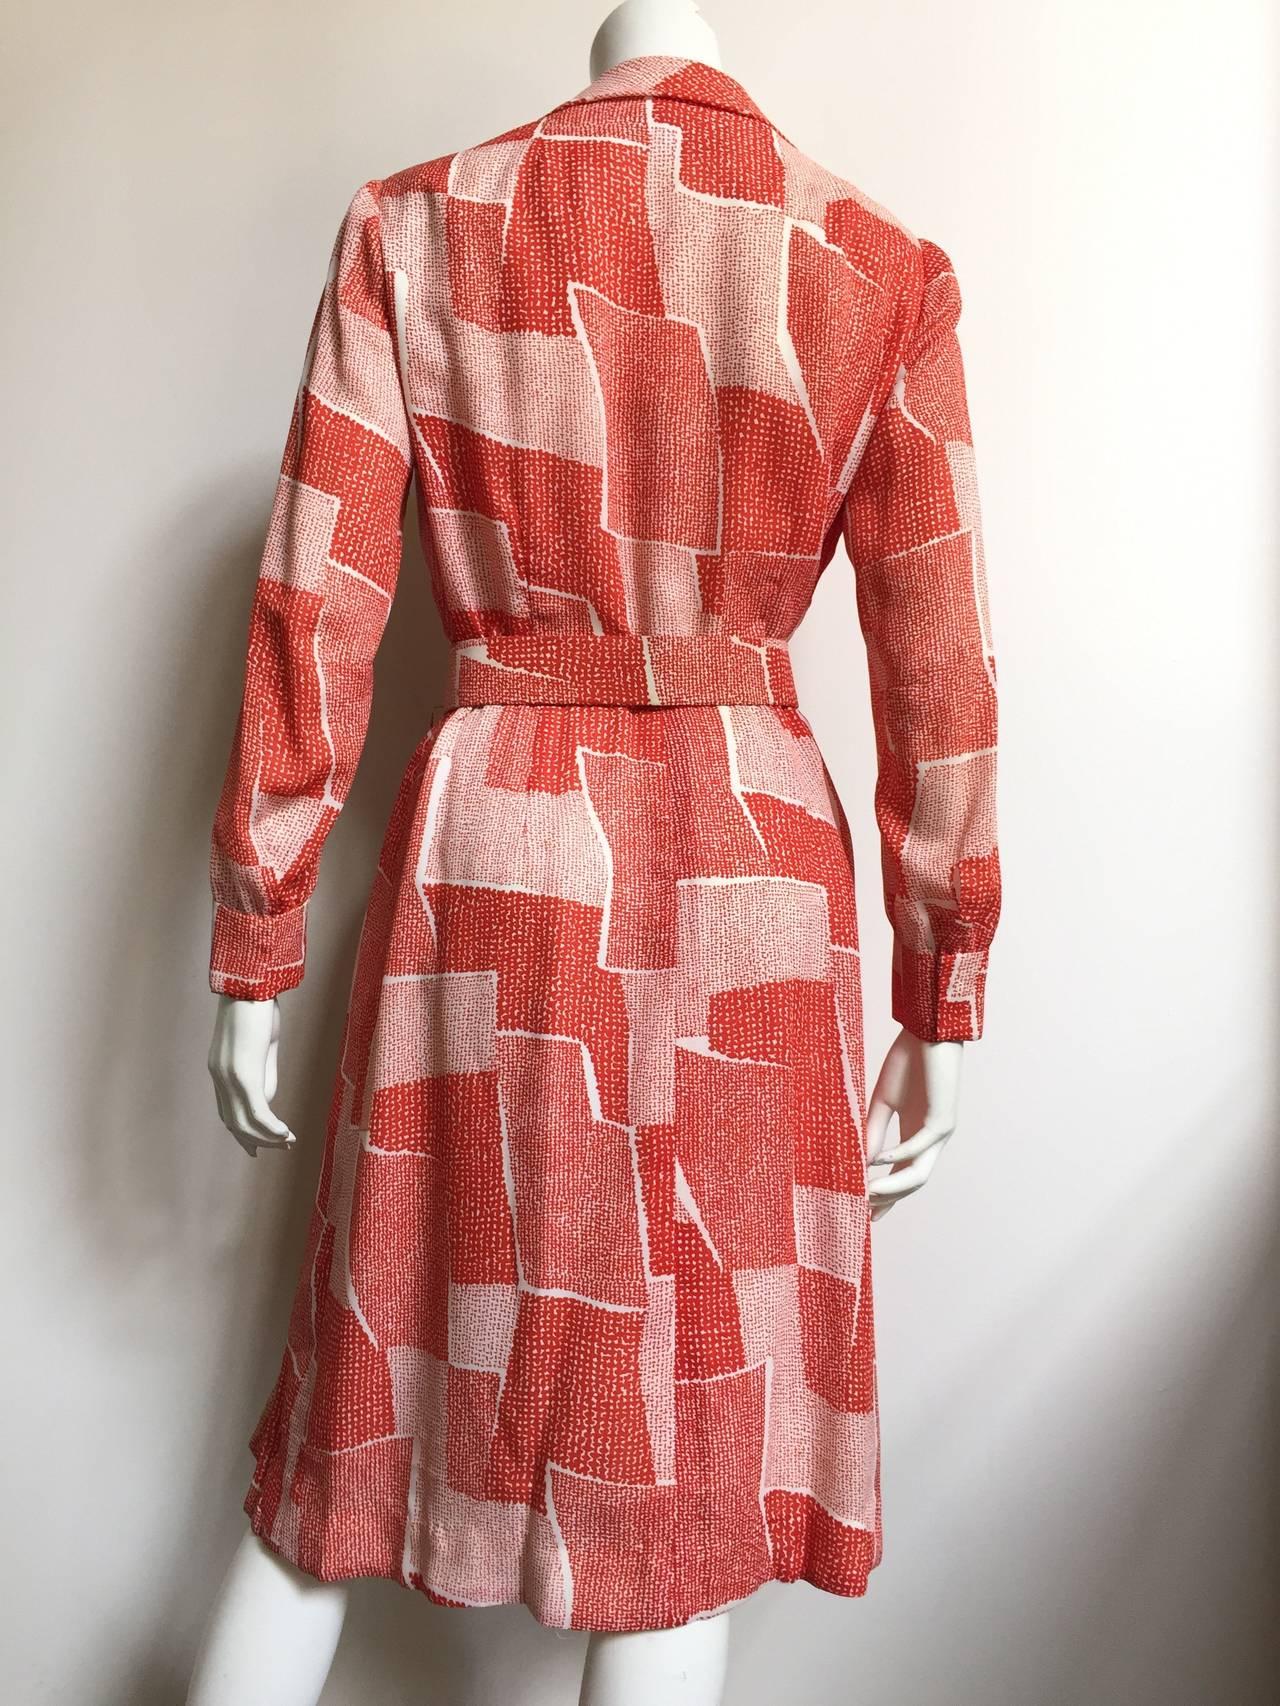 Adele Simpson 70s Dress Size 8. 5